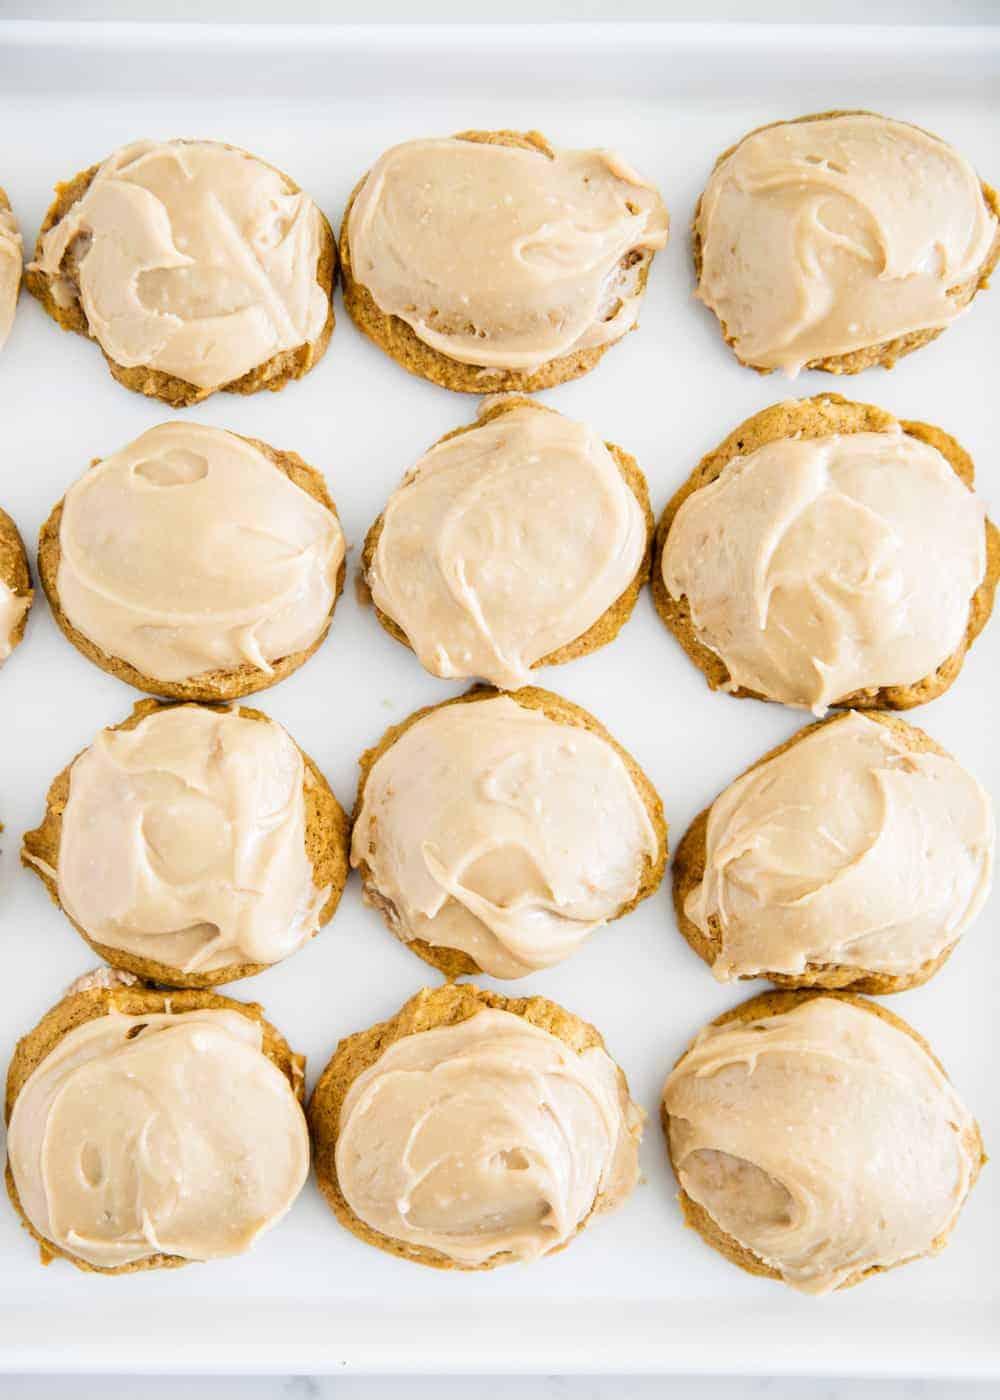 iced pumpkin cookies on a plate